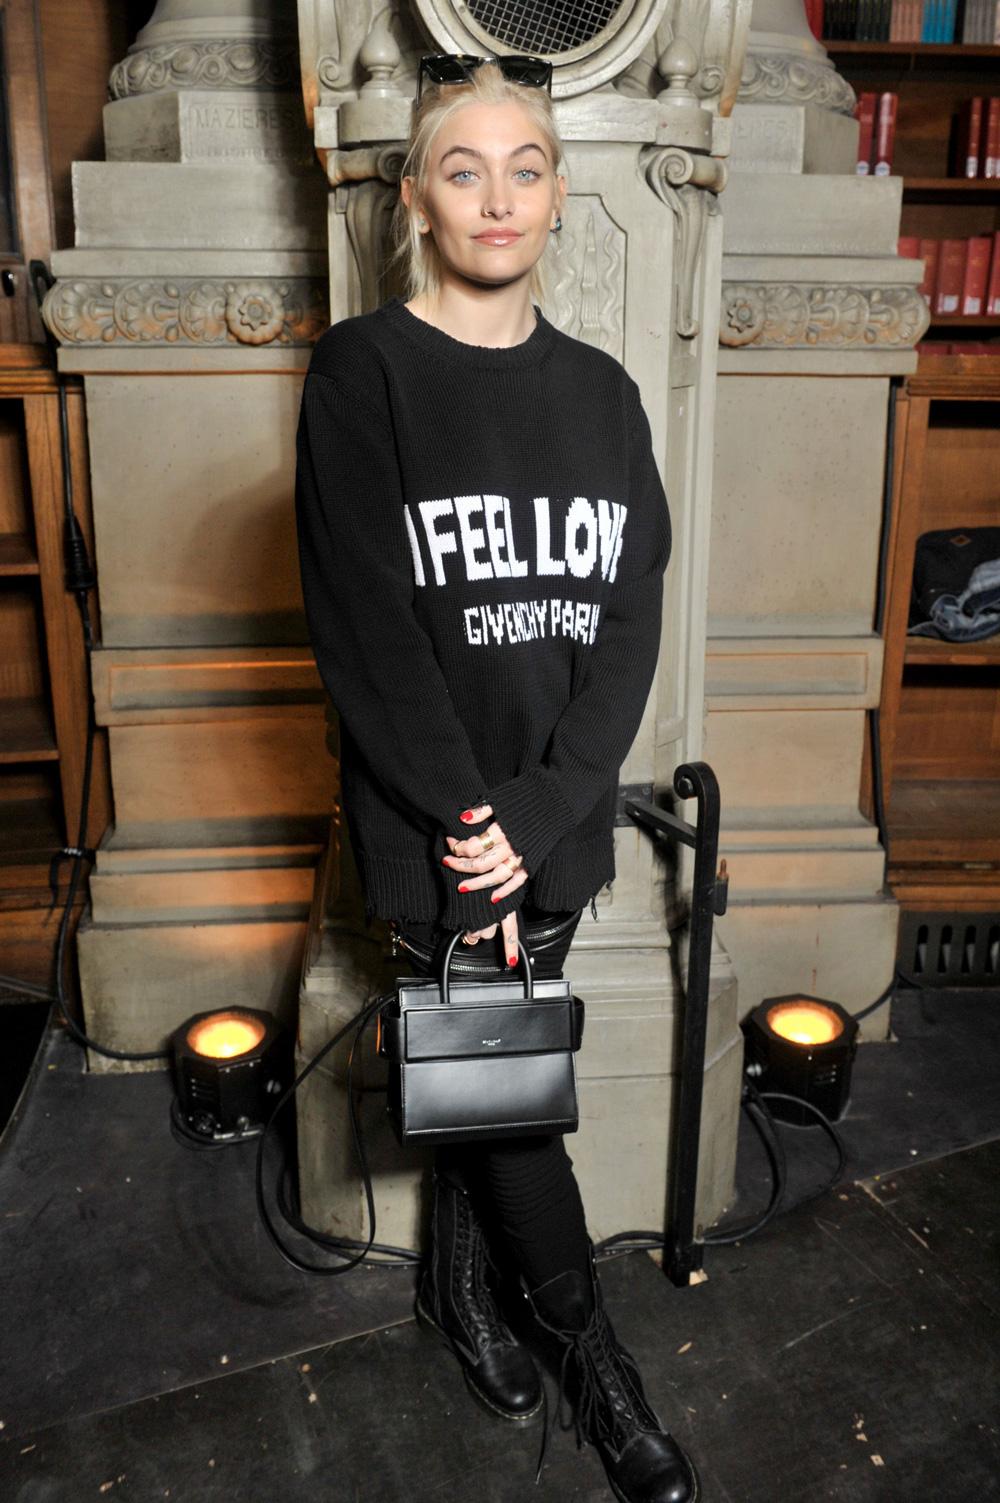 Gaya Para Selebritas Kala Menghadiri Gelaran Mode Givenchy F/W Men's 17